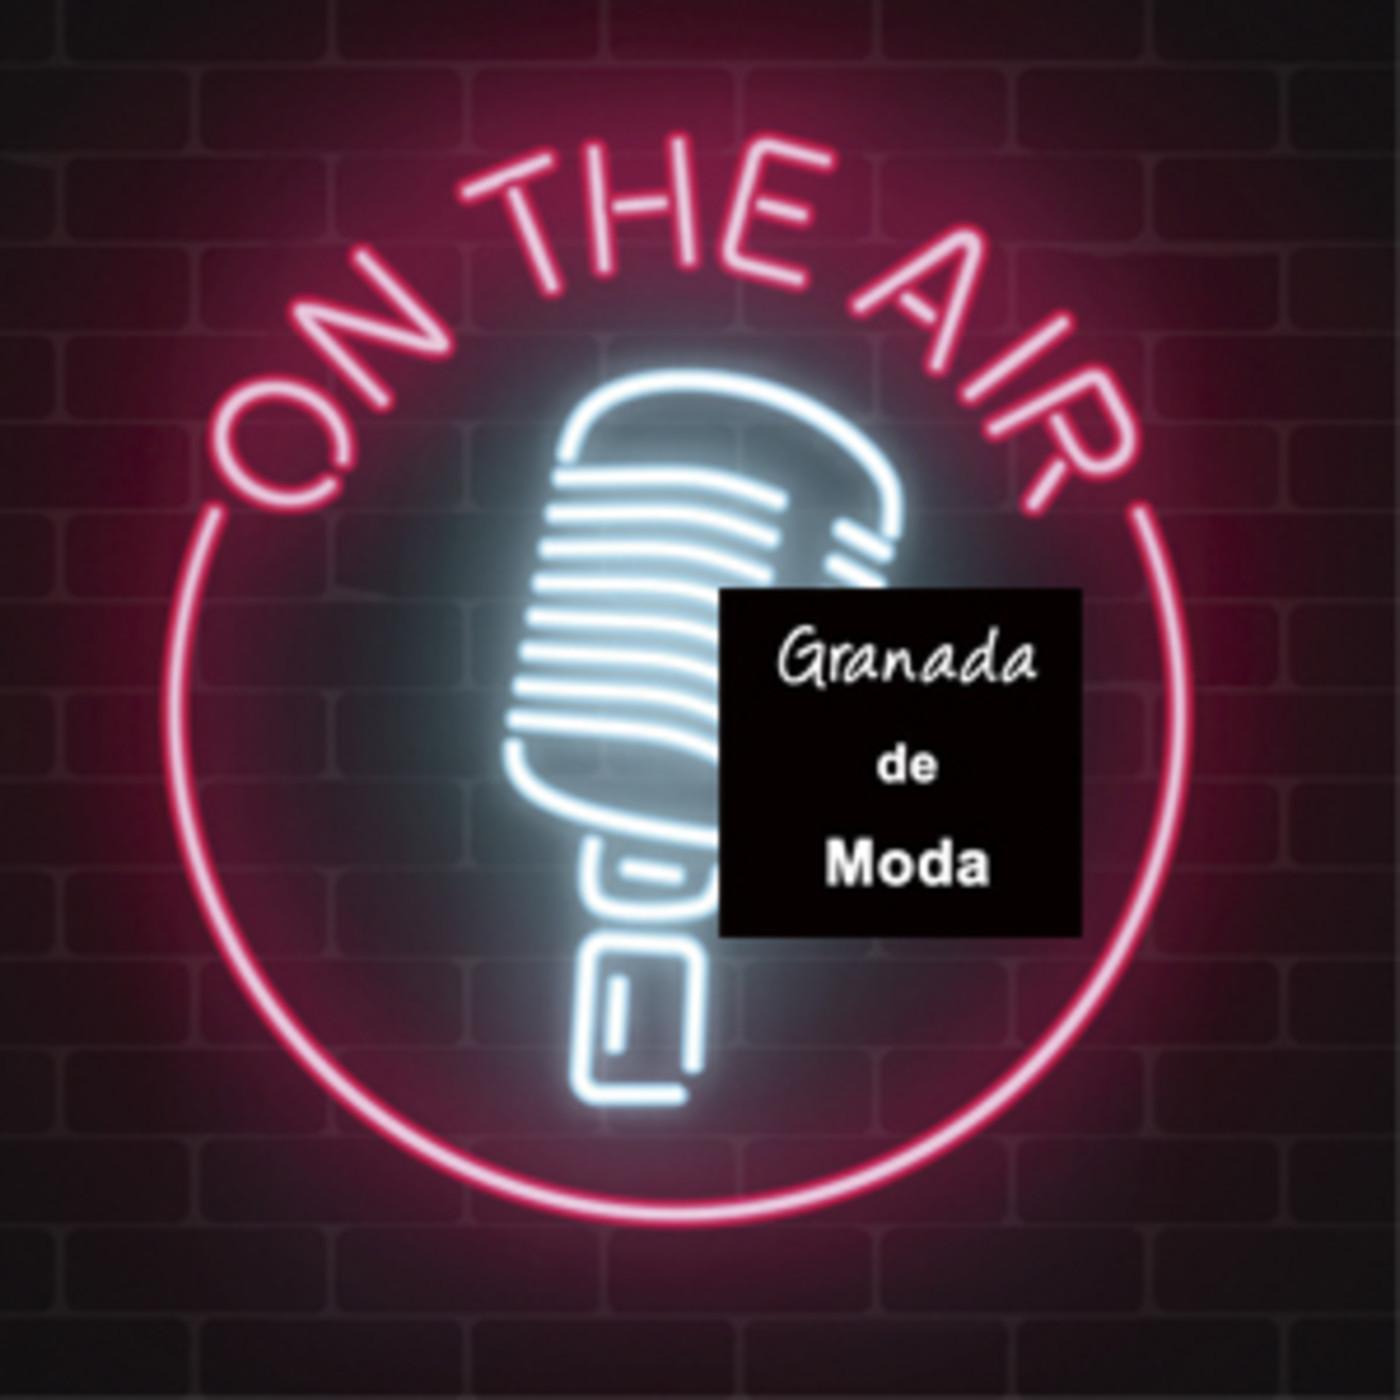 GranadaDeModa:GranadaDeModa